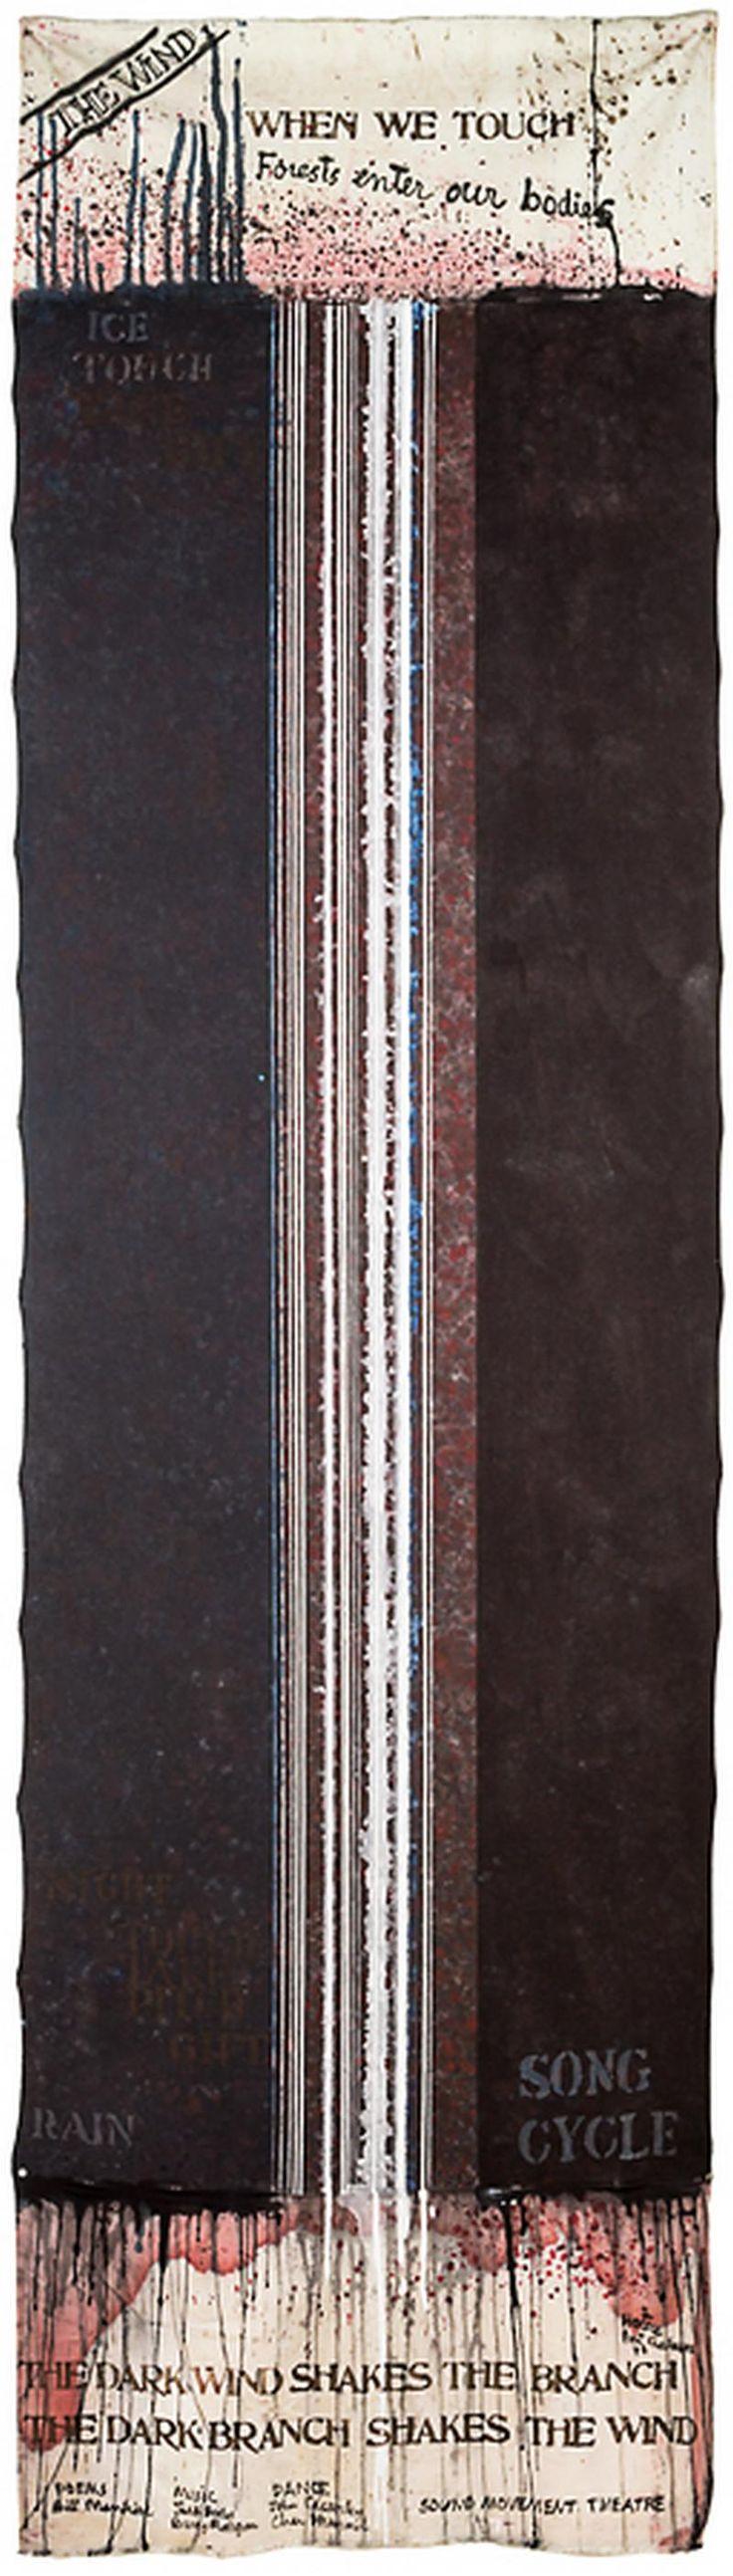 The Sweet Slag Song of Aramoana: Aluminpolitik (800×2812)